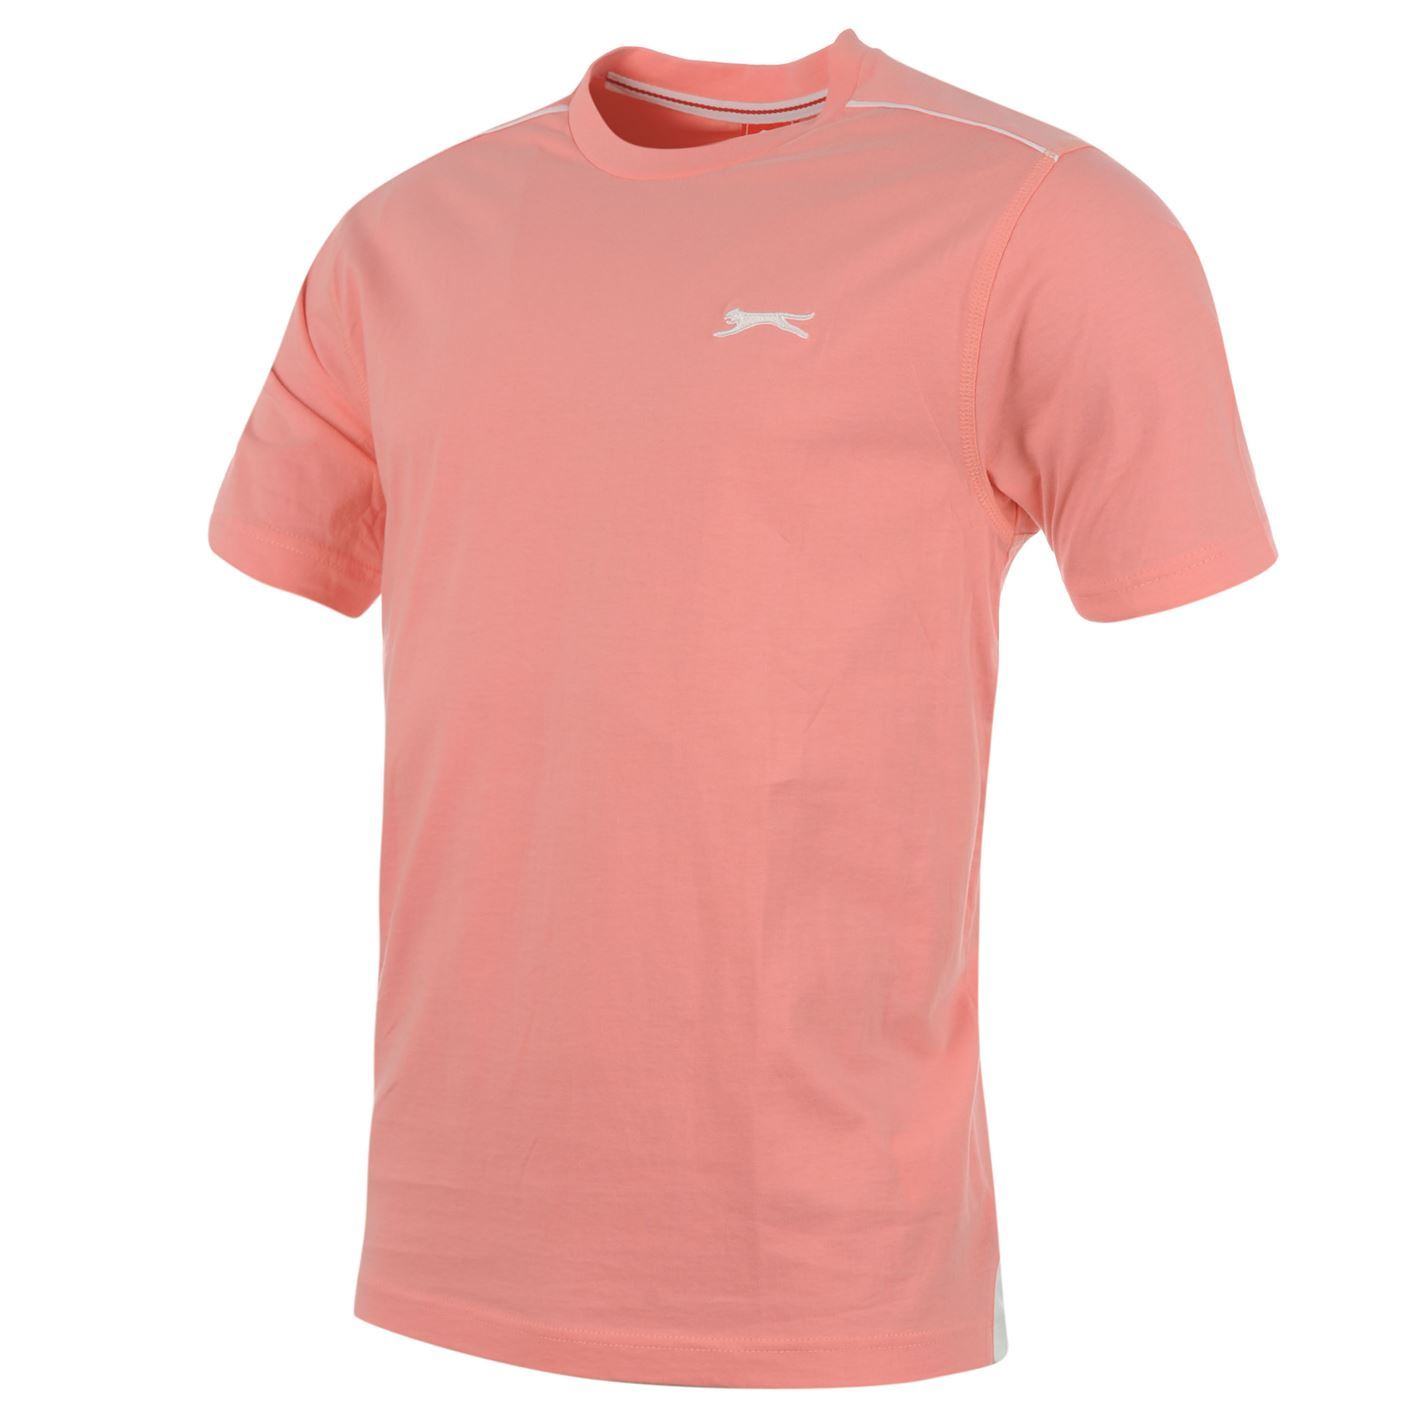 7fdb060668 Slazenger Plain T Shirt Mens Pink Top Tee Tshirt | eBay